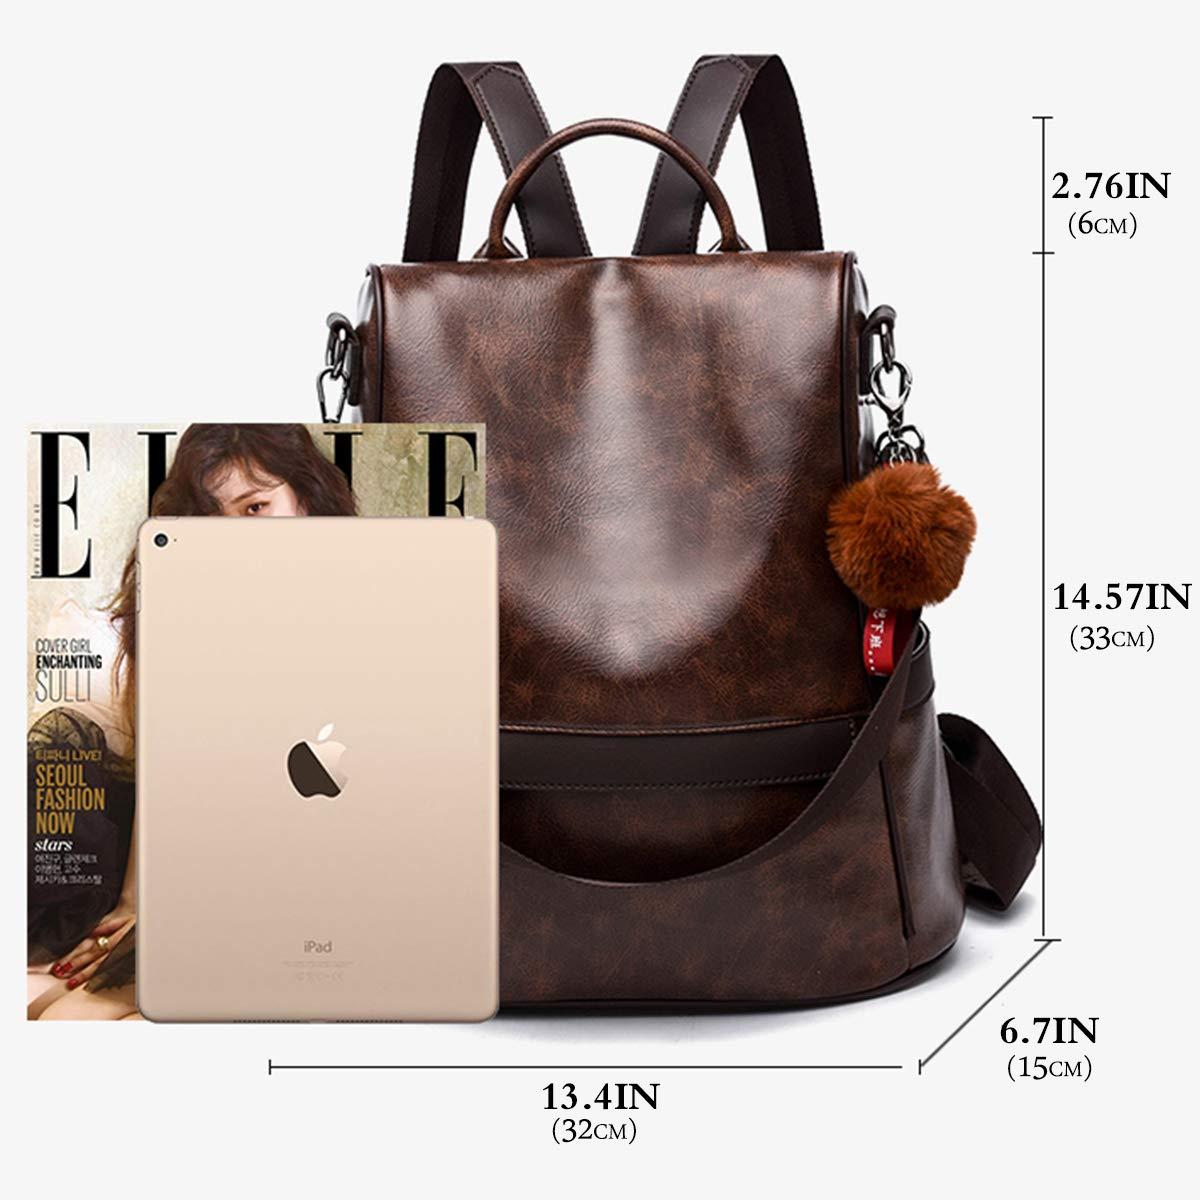 f71eecf3e Anti-robo Mujer Mochila de Cuero de pu mochila de Bolsa de mano Mochilas  Casual Bolsa de viaje Messenger Bag Backpack